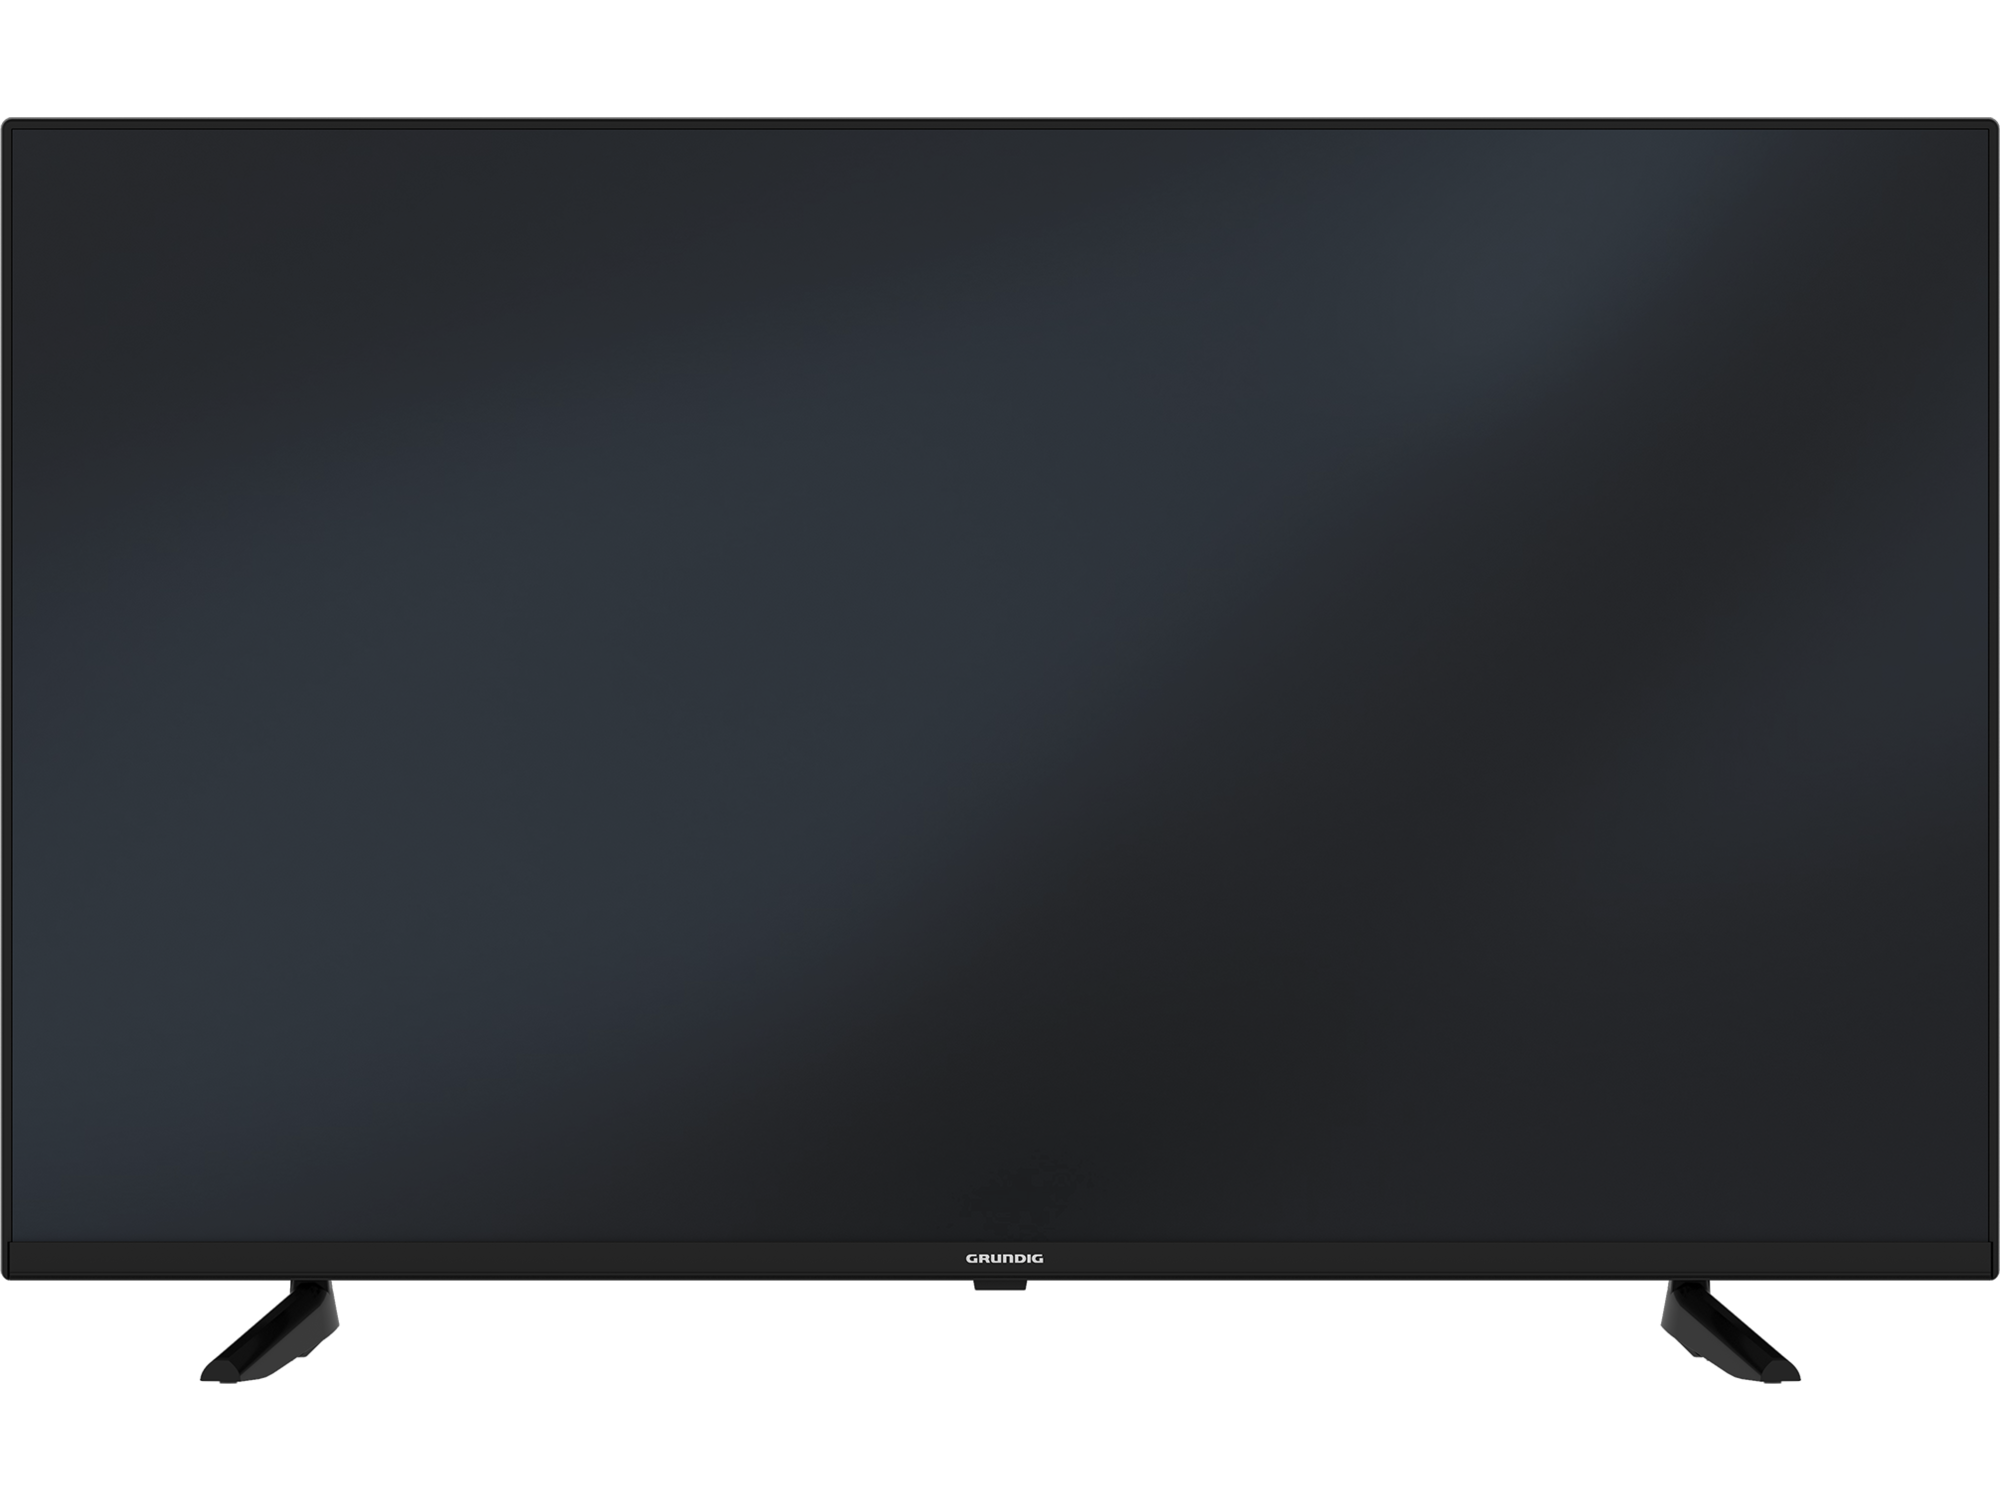 Grundig Televizor 50 GEU 7800